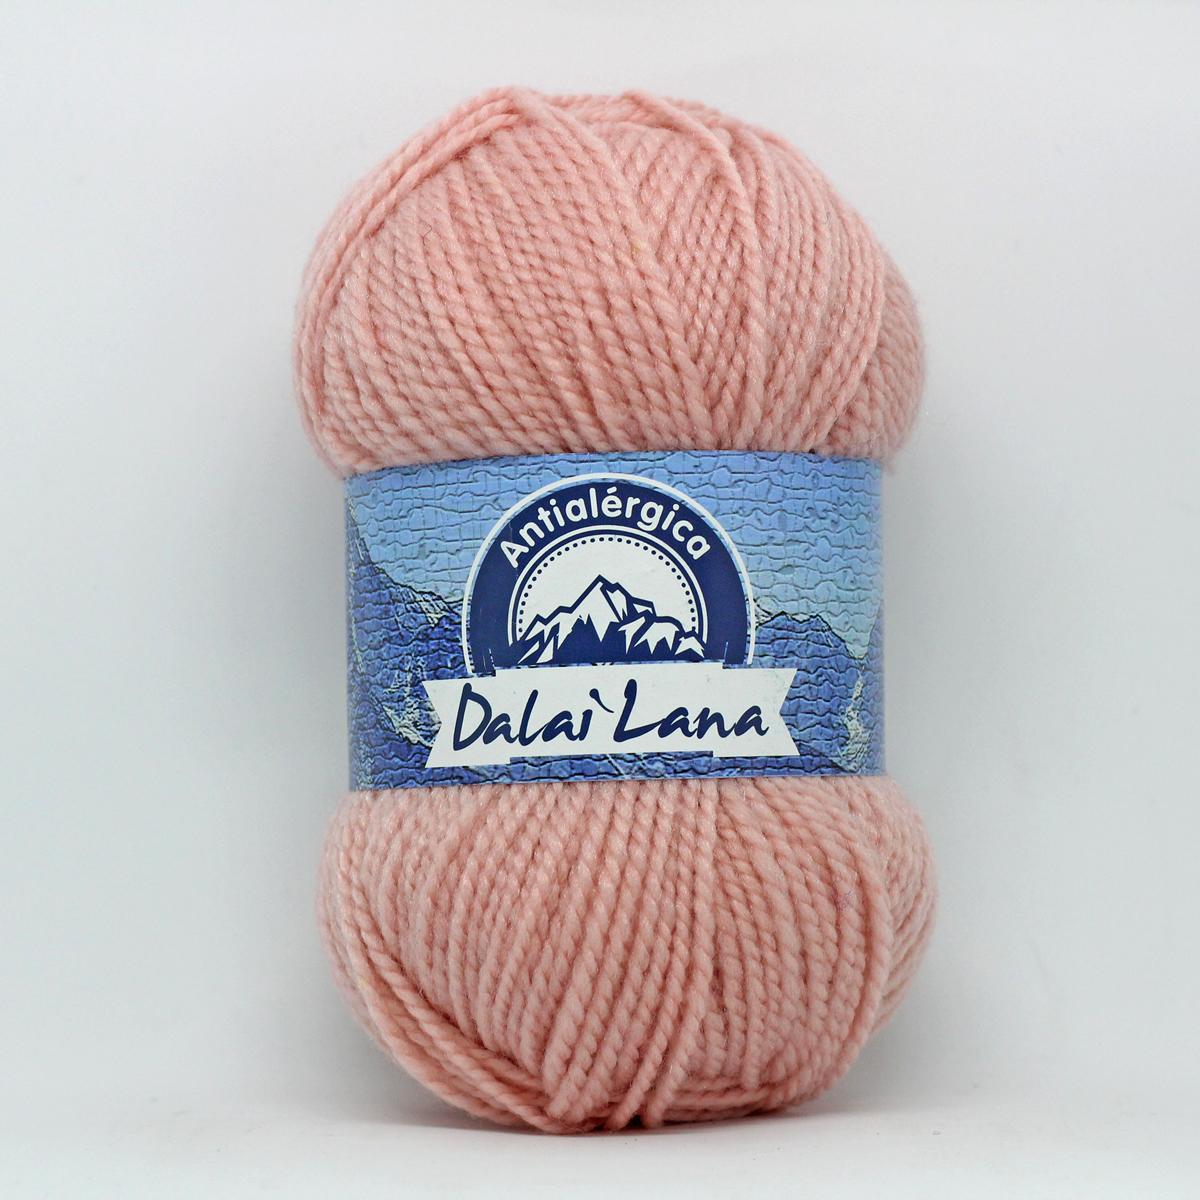 Dalai Lana - 756